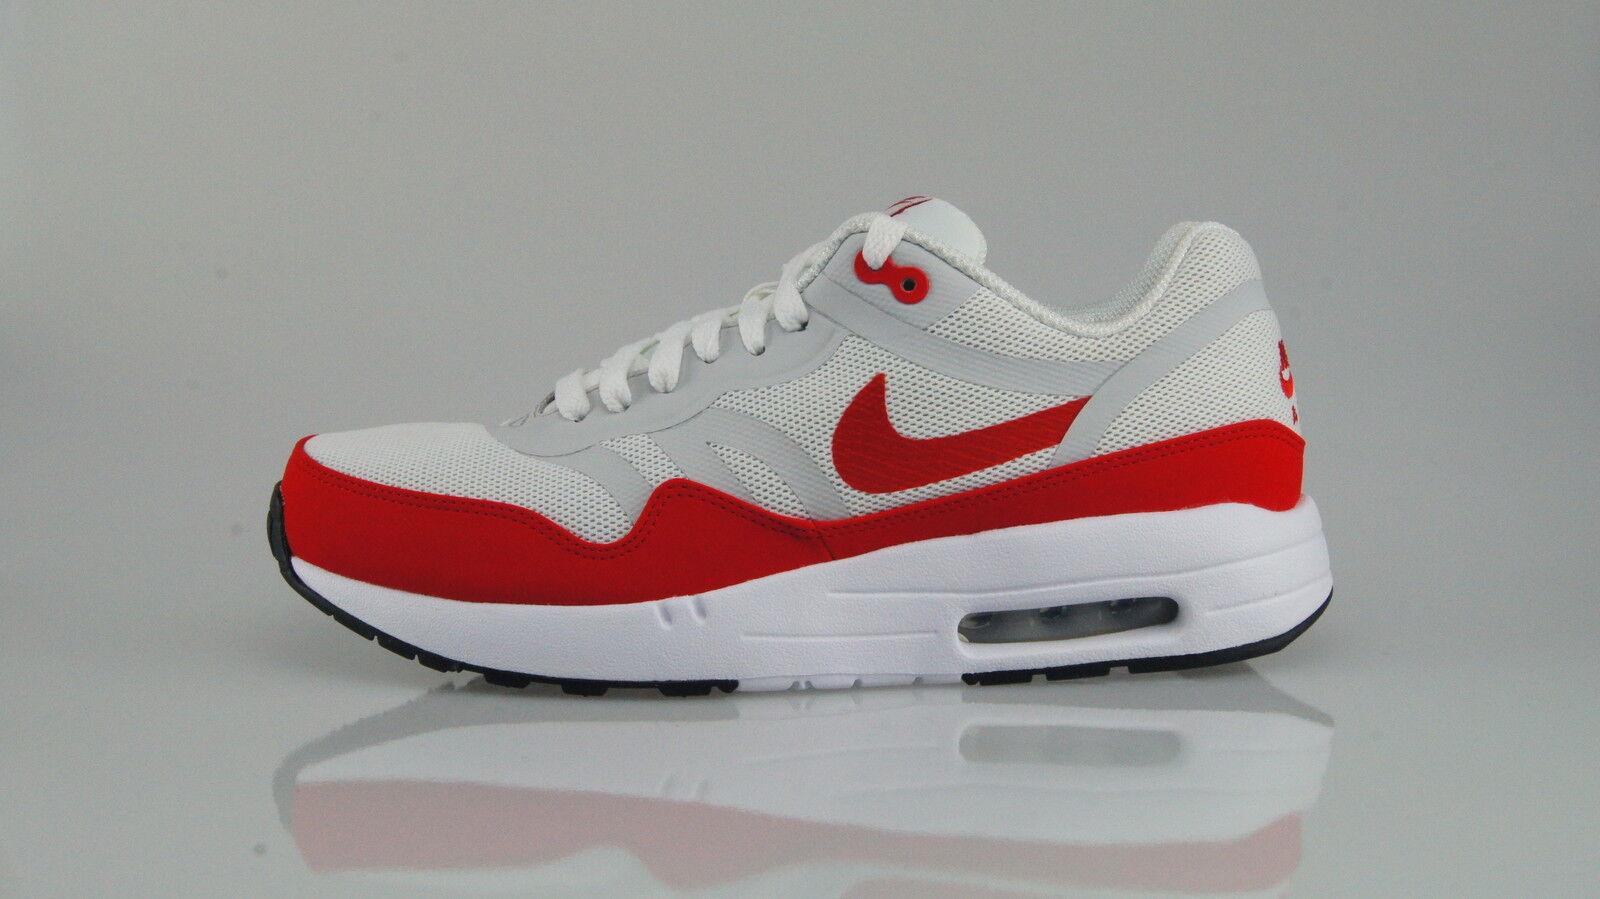 Nike air max 1 t nastro qs misura 40 (7us)